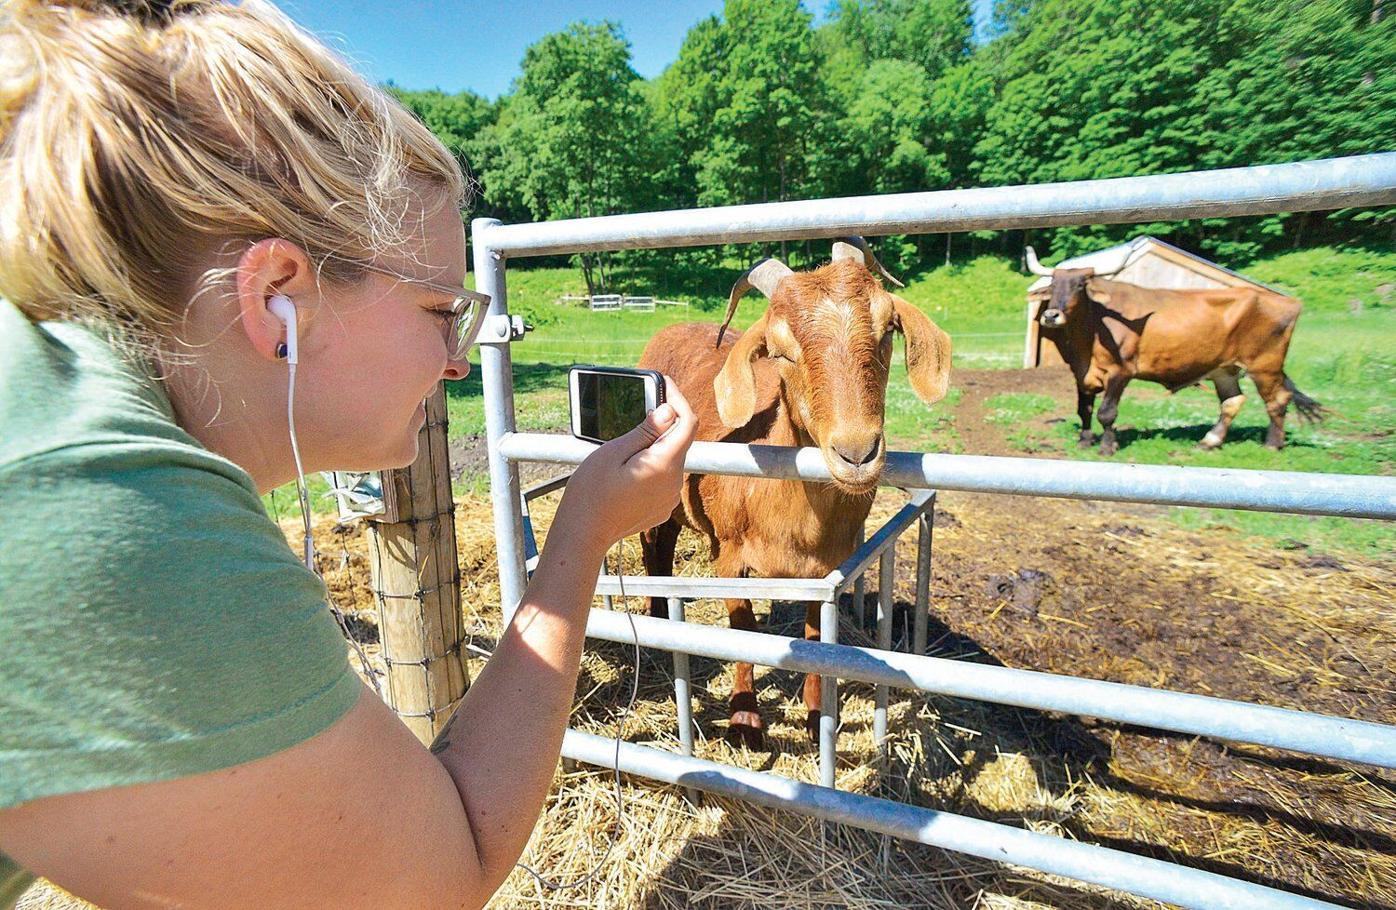 Retreat Farm brings goats inside, virtually